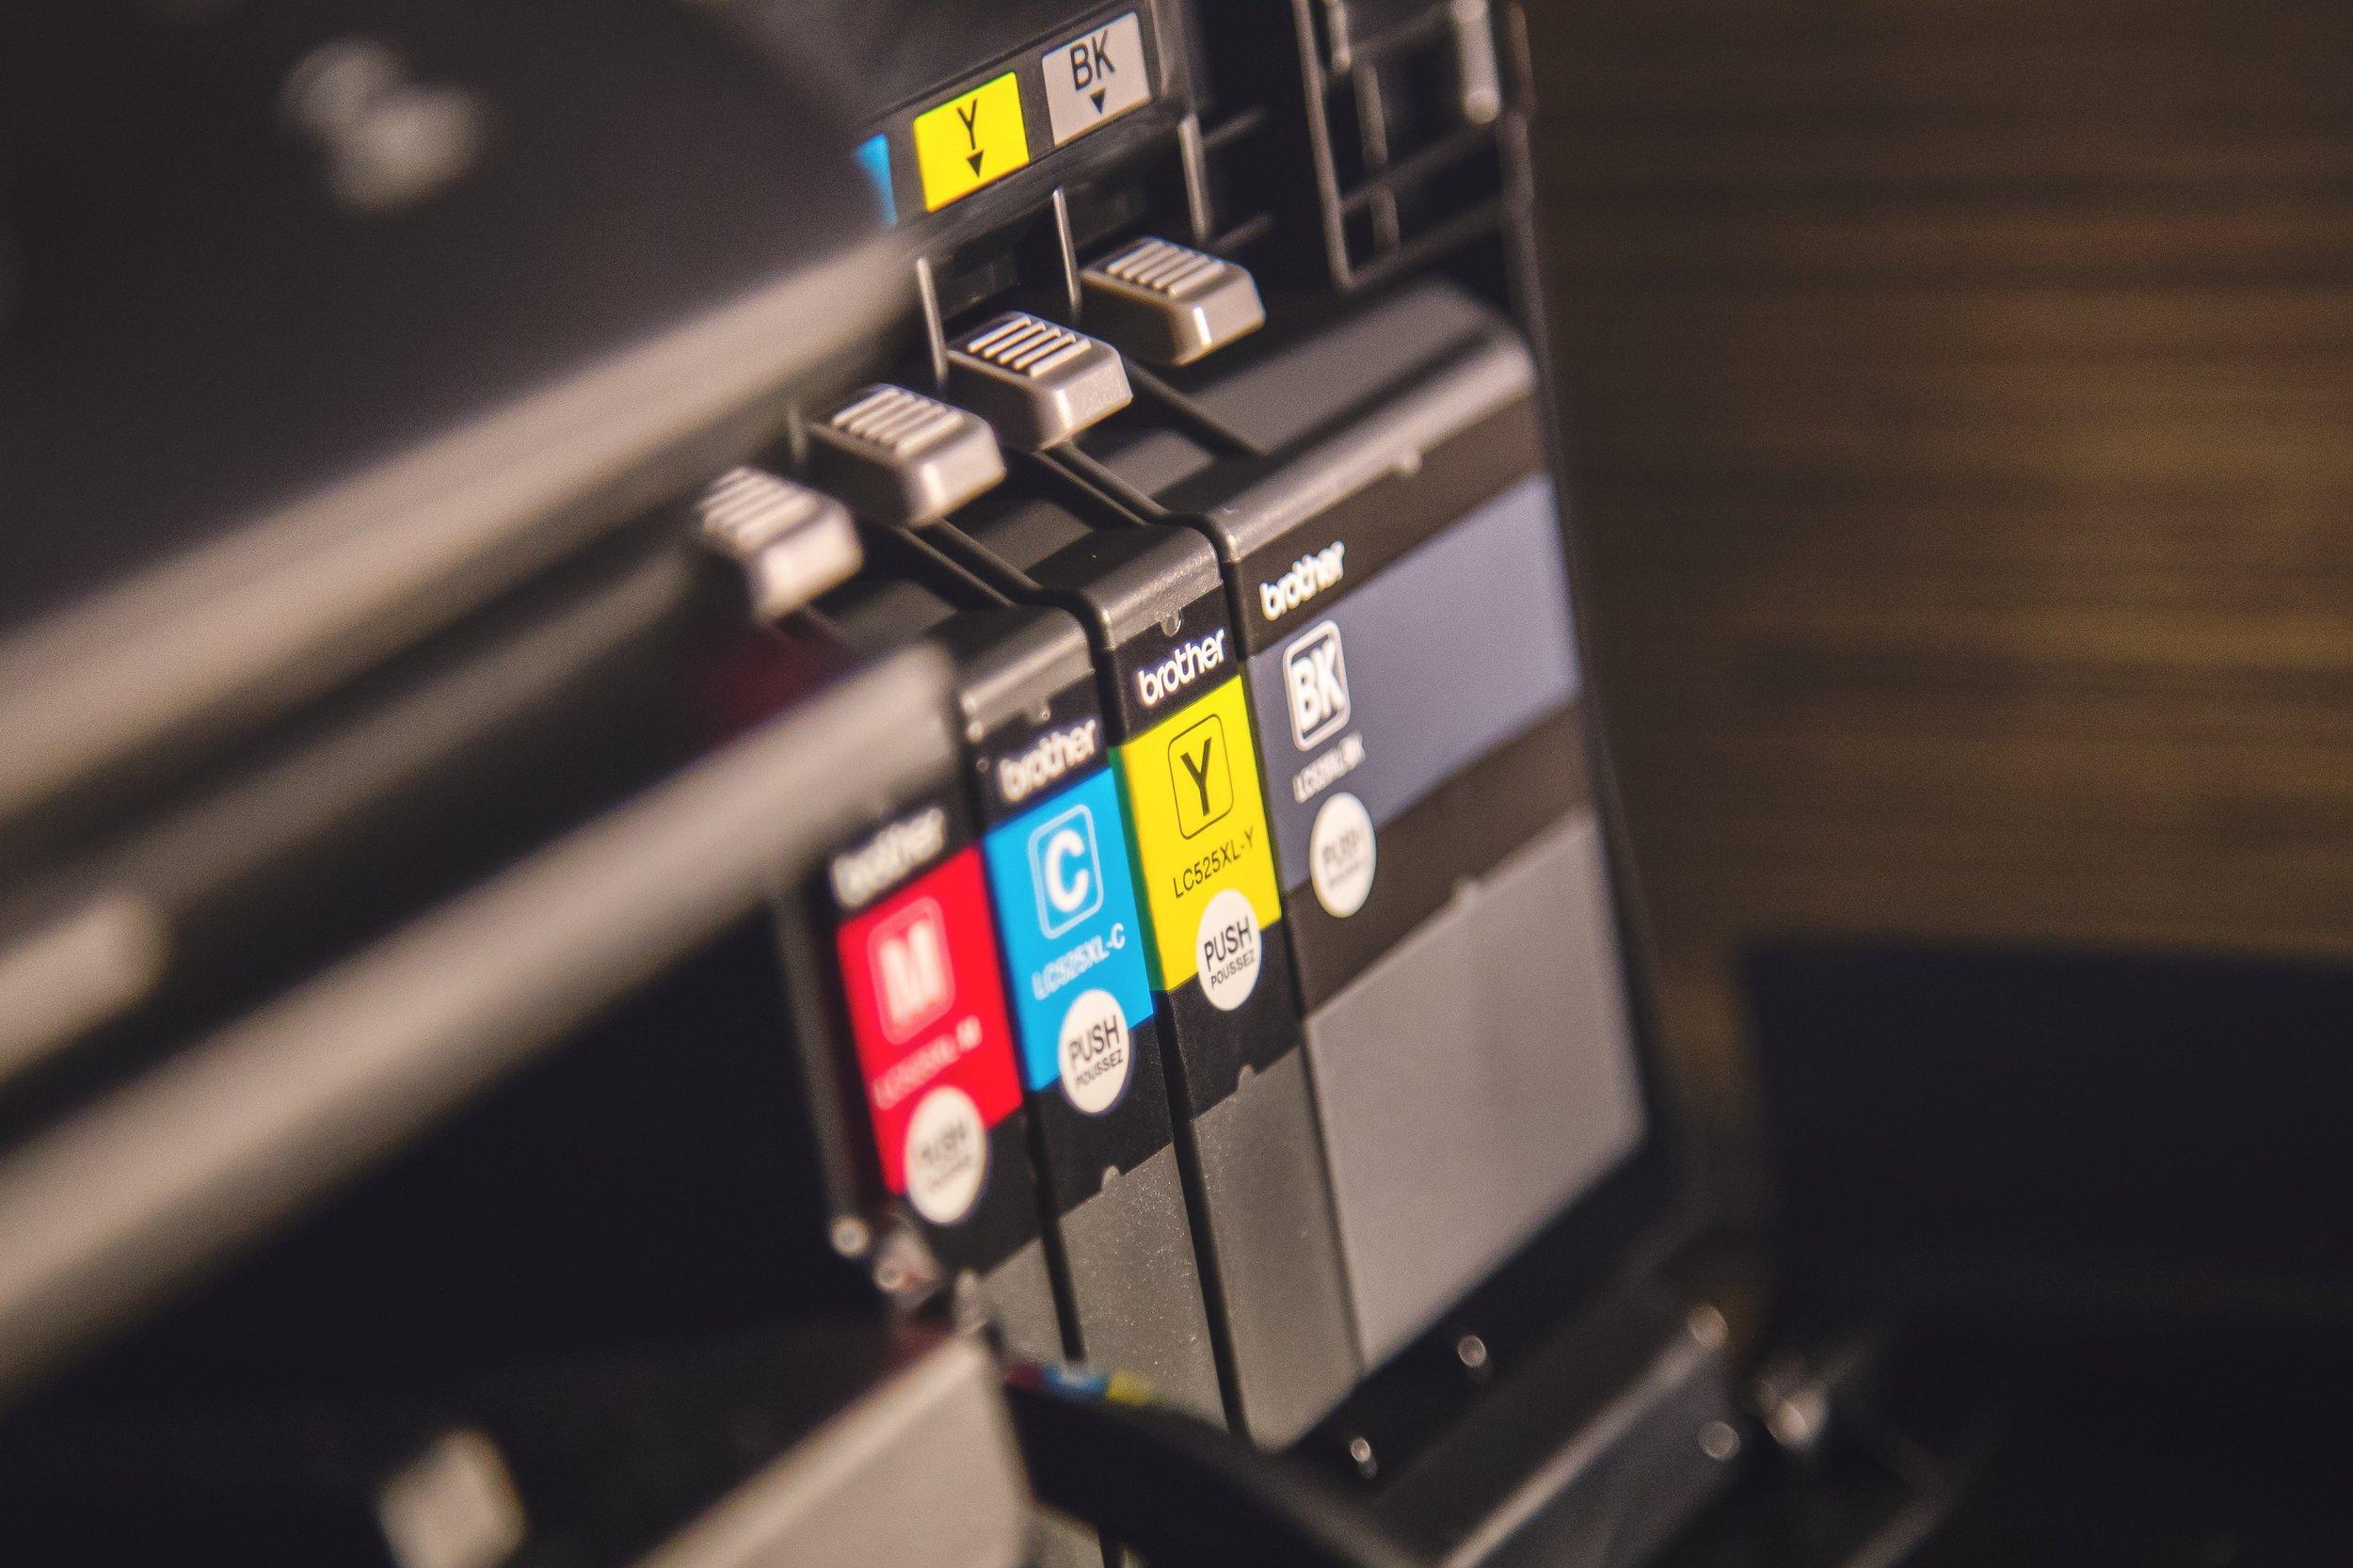 printer-933098 (1).jpg